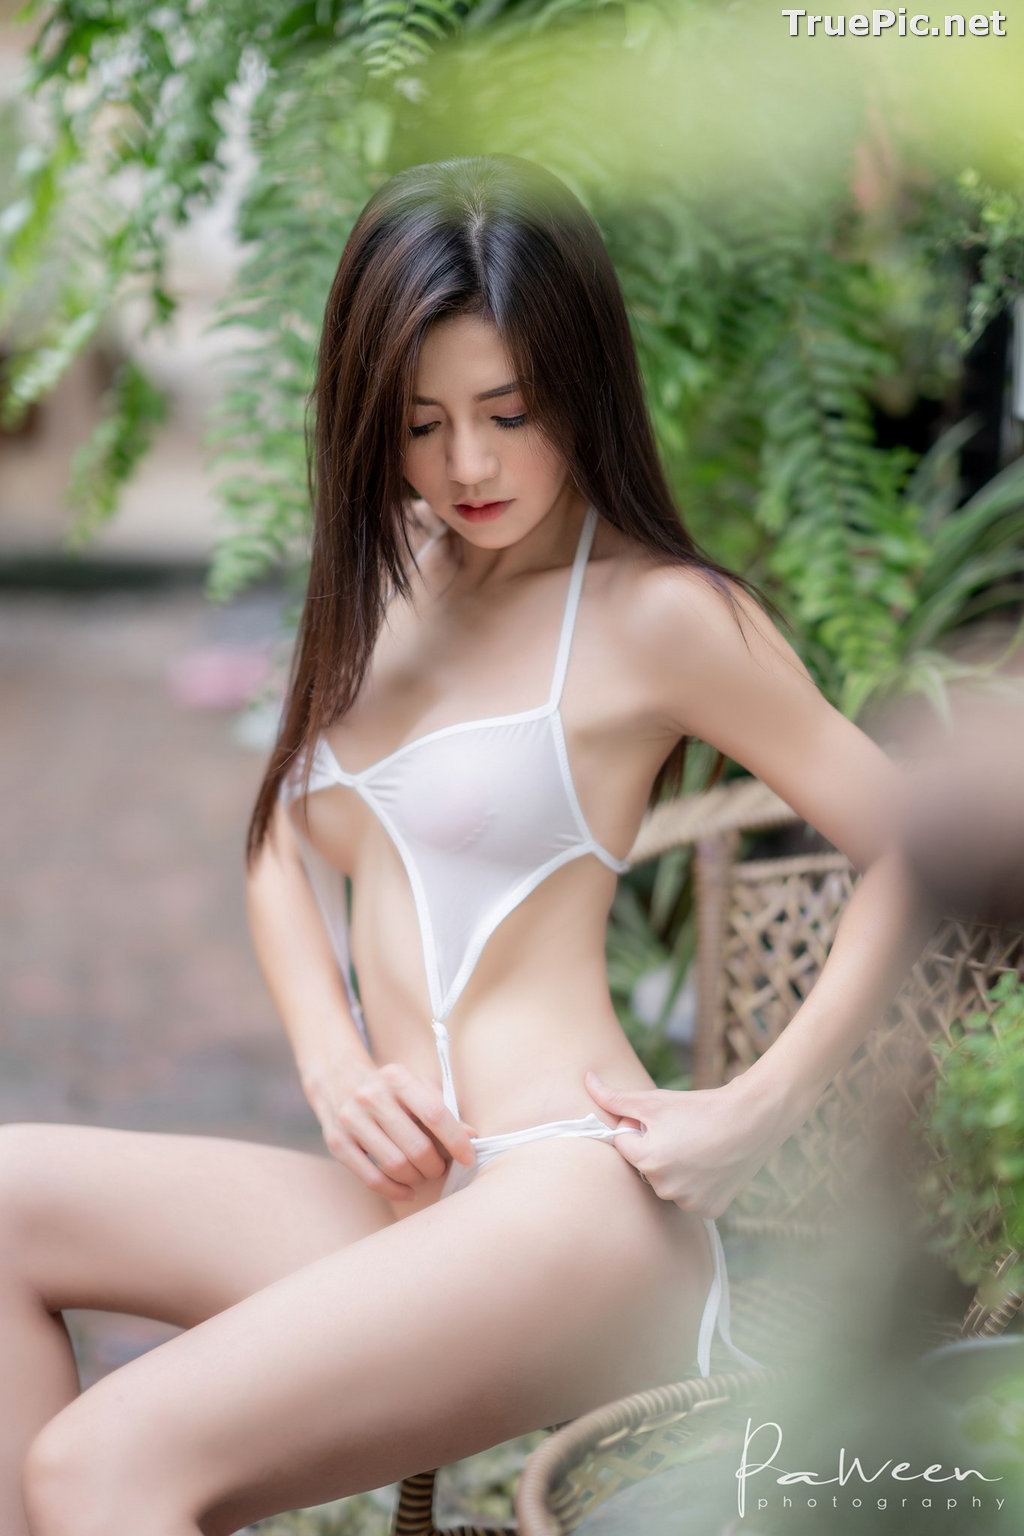 Image Thailand Model - Ladapa Ratchataamonchot - Sexy Garden - TruePic.net - Picture-6